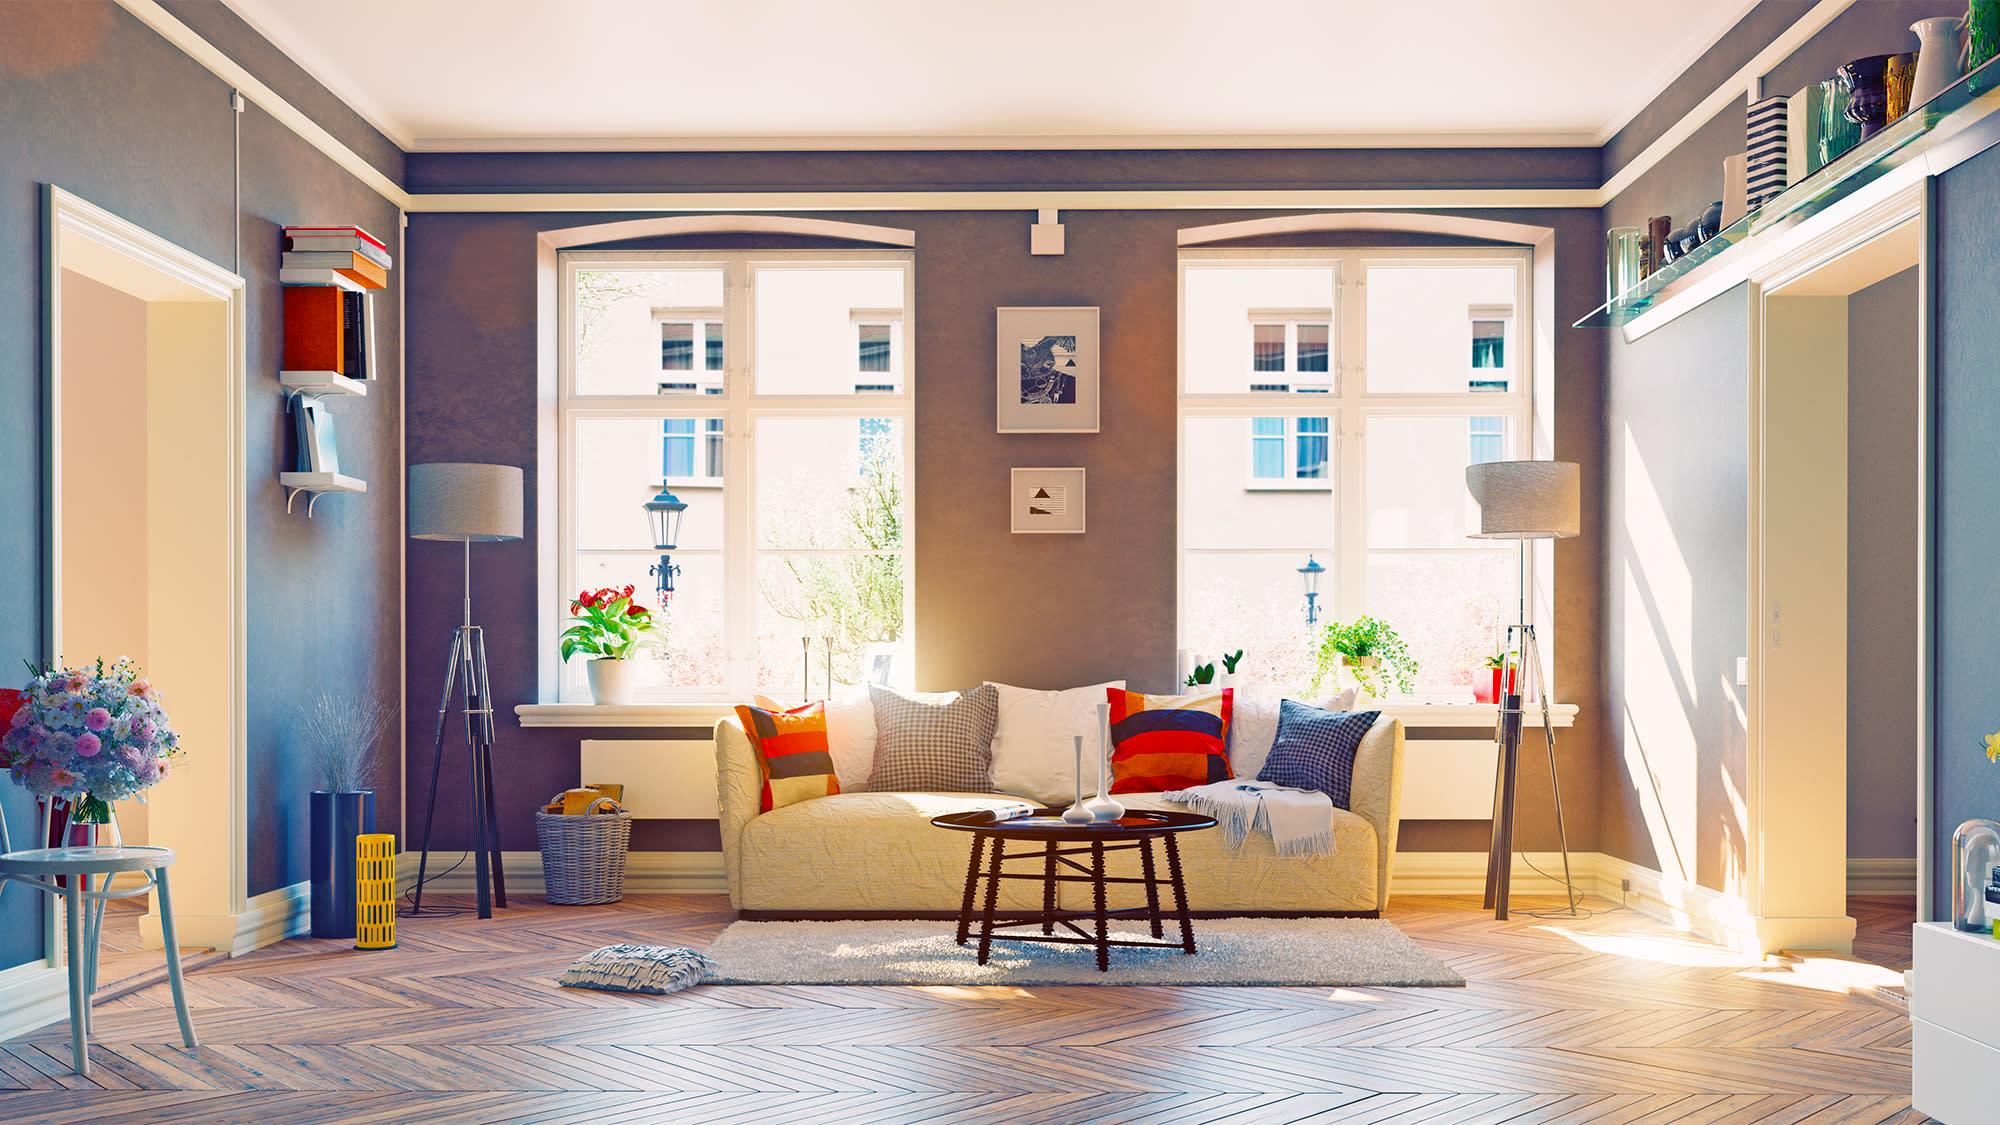 7 apartment decor ideas that turn a ho